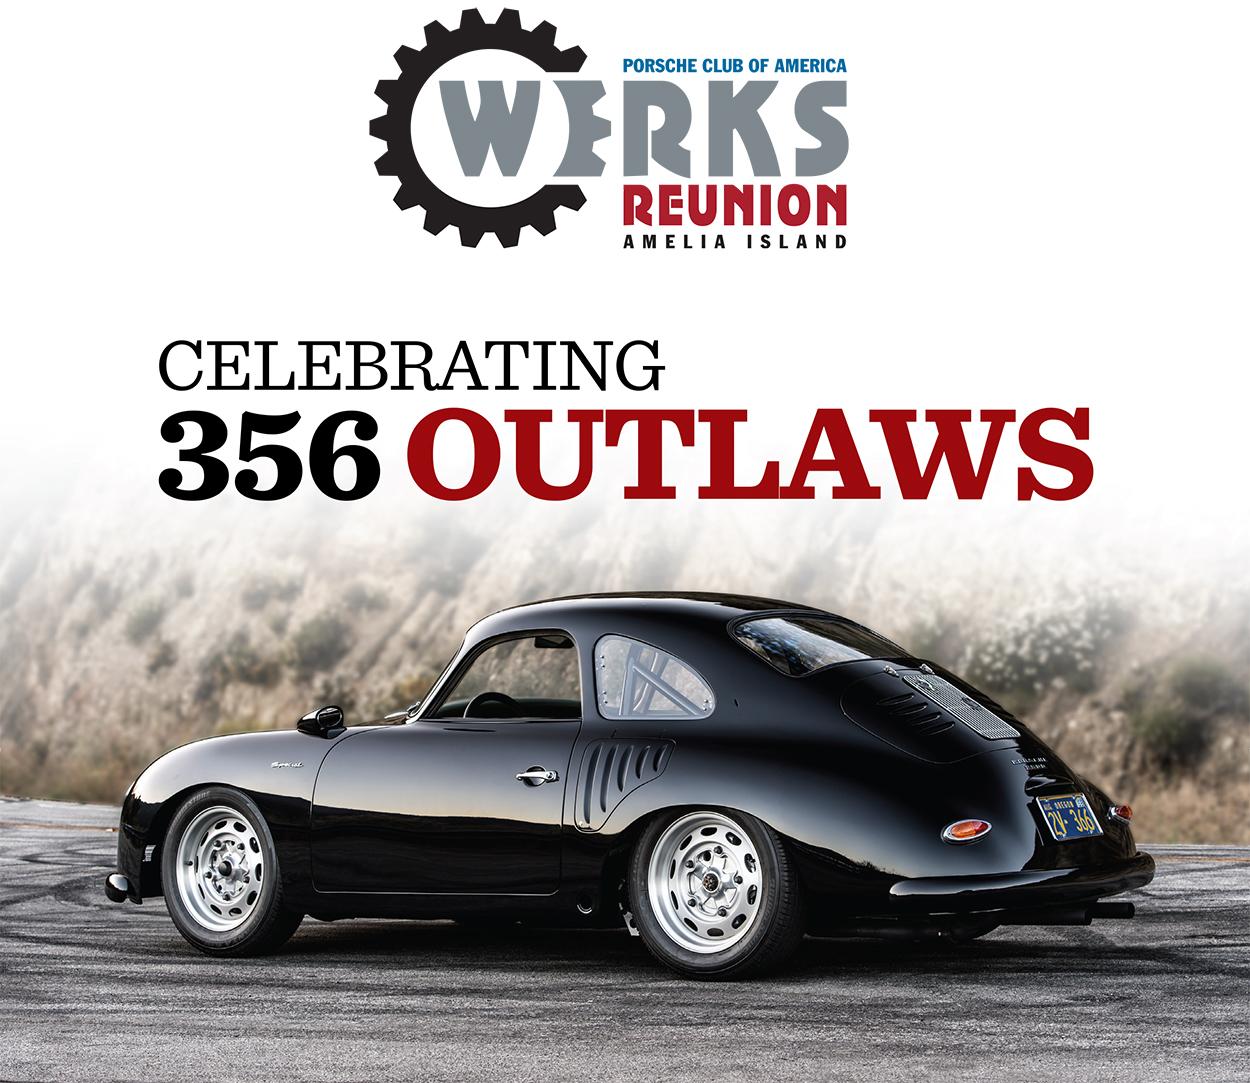 Werks Reunion Amelia Island Porsche Club Of America - Amelia island classic car show